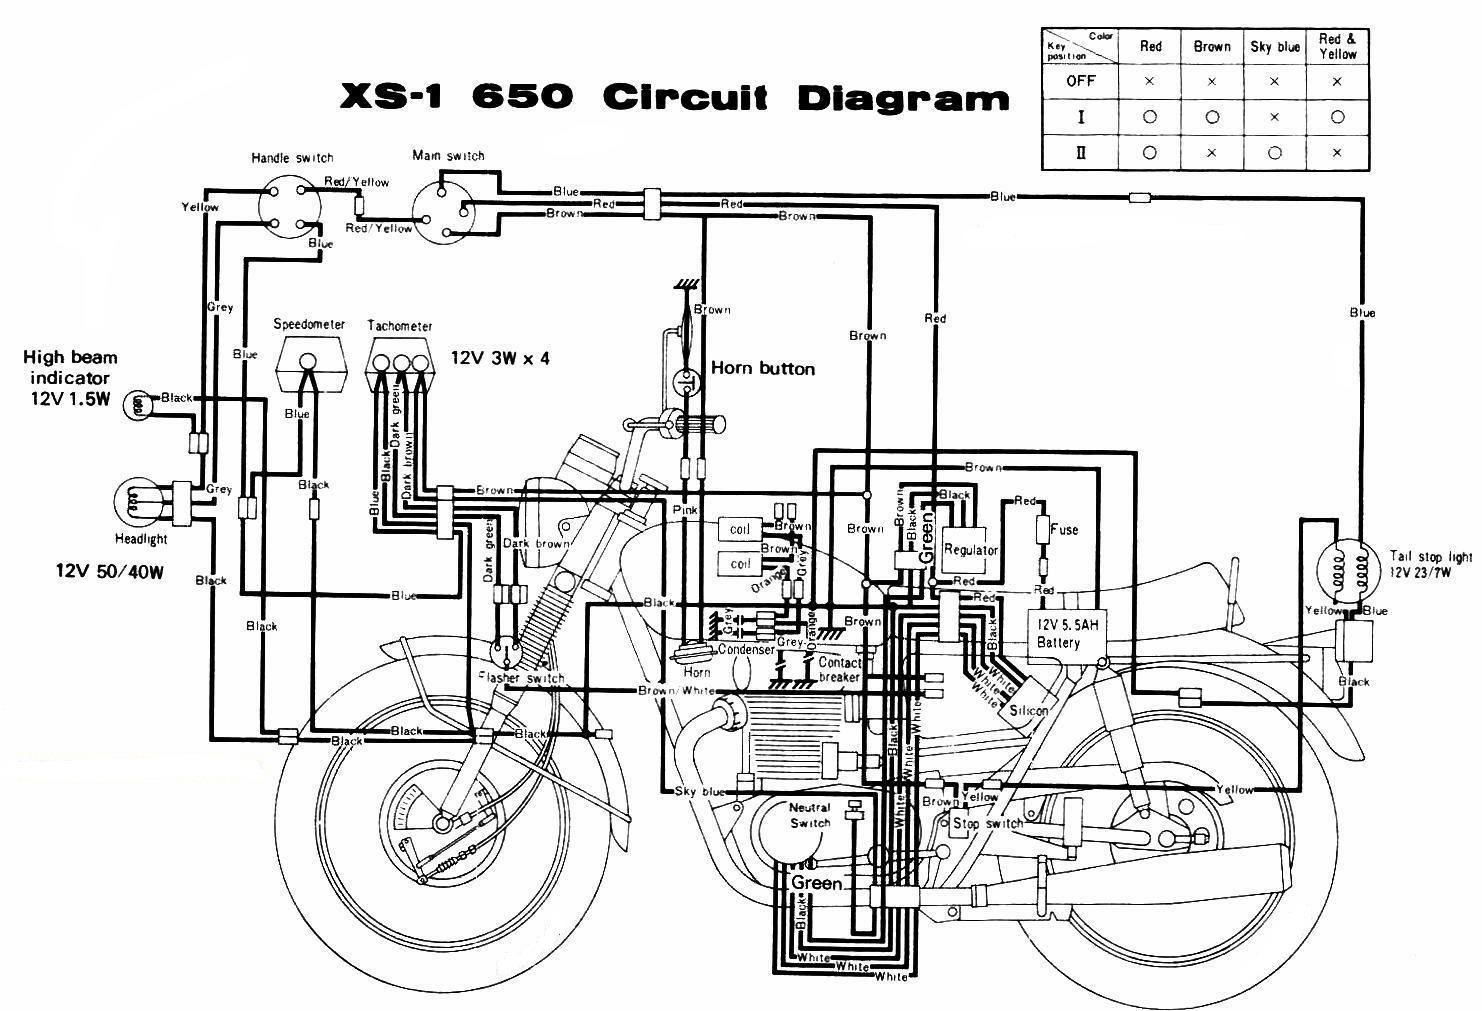 Honda Motorcycle Electrical Wiring Diagram   Manual E-Books - Honda Motorcycle Wiring Diagram